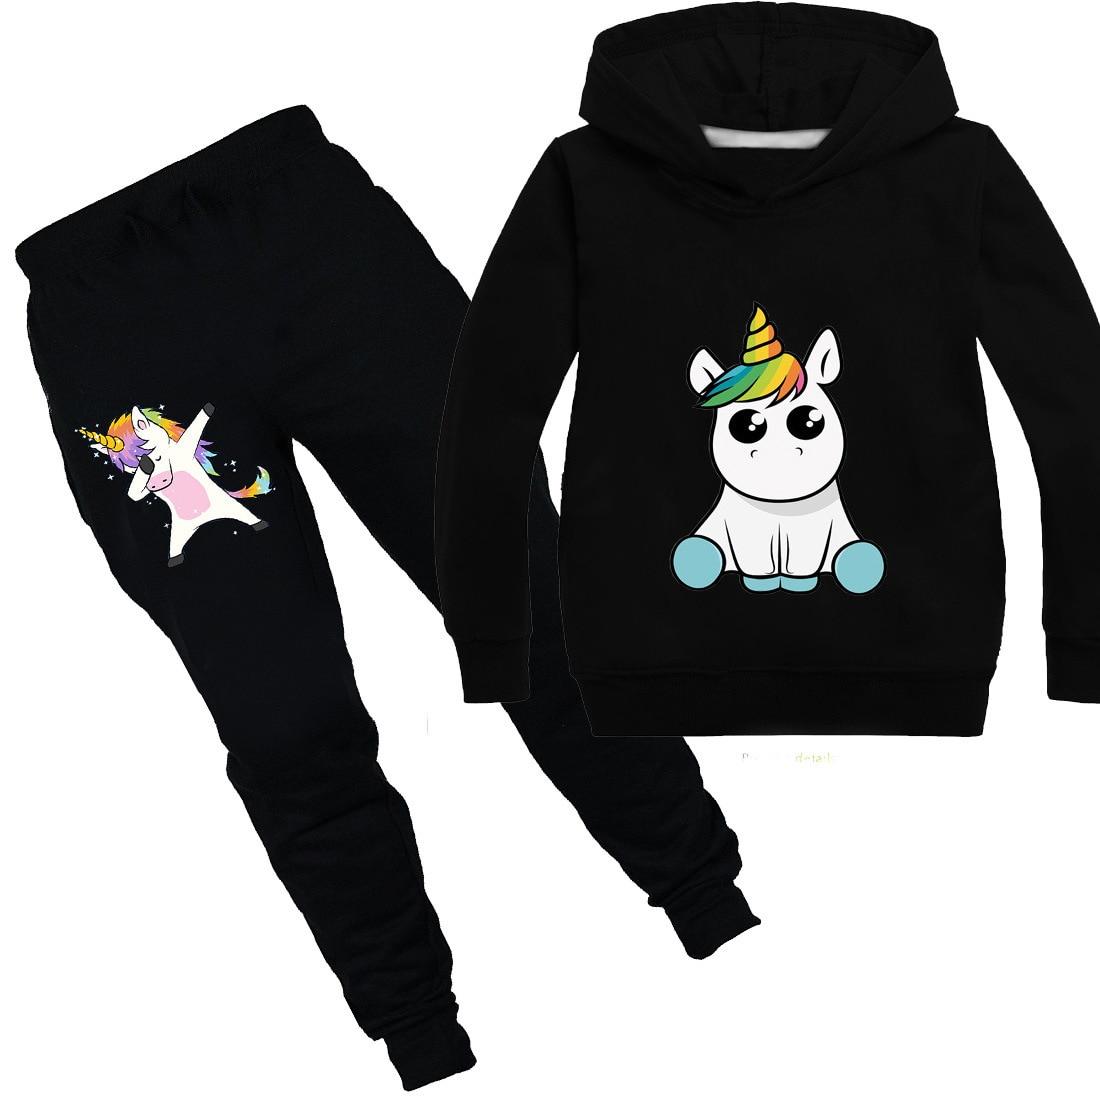 Unicornio sudaderas niños sudaderas moda niños camiseta con capucha bebé niño niñas abrigo niños ropa niños camisetas casuales ropa deportiva